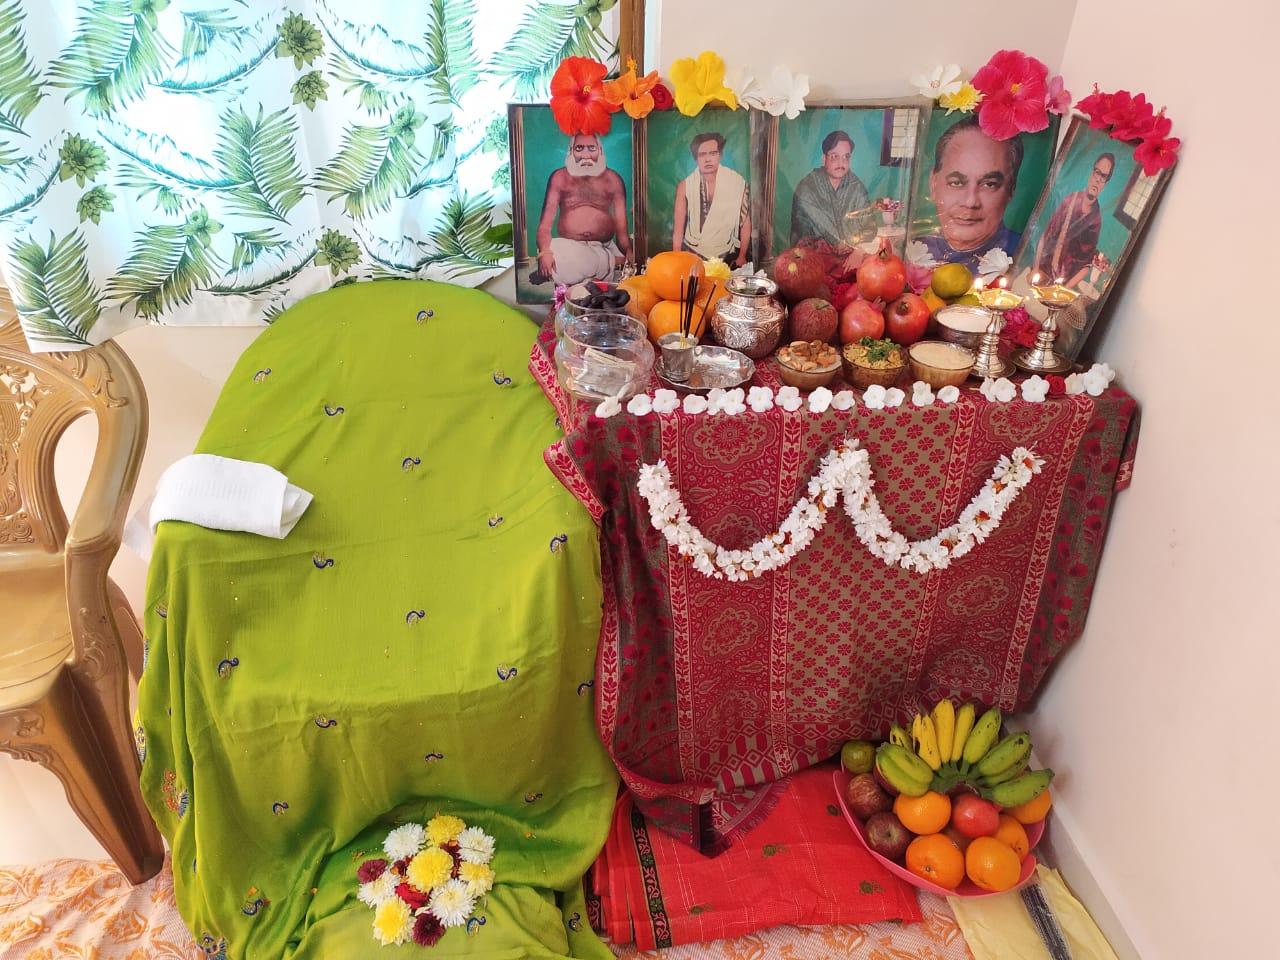 01-Garapati-Aaradhana-Sajjapuram-Tanuku-WG-AP-02022020